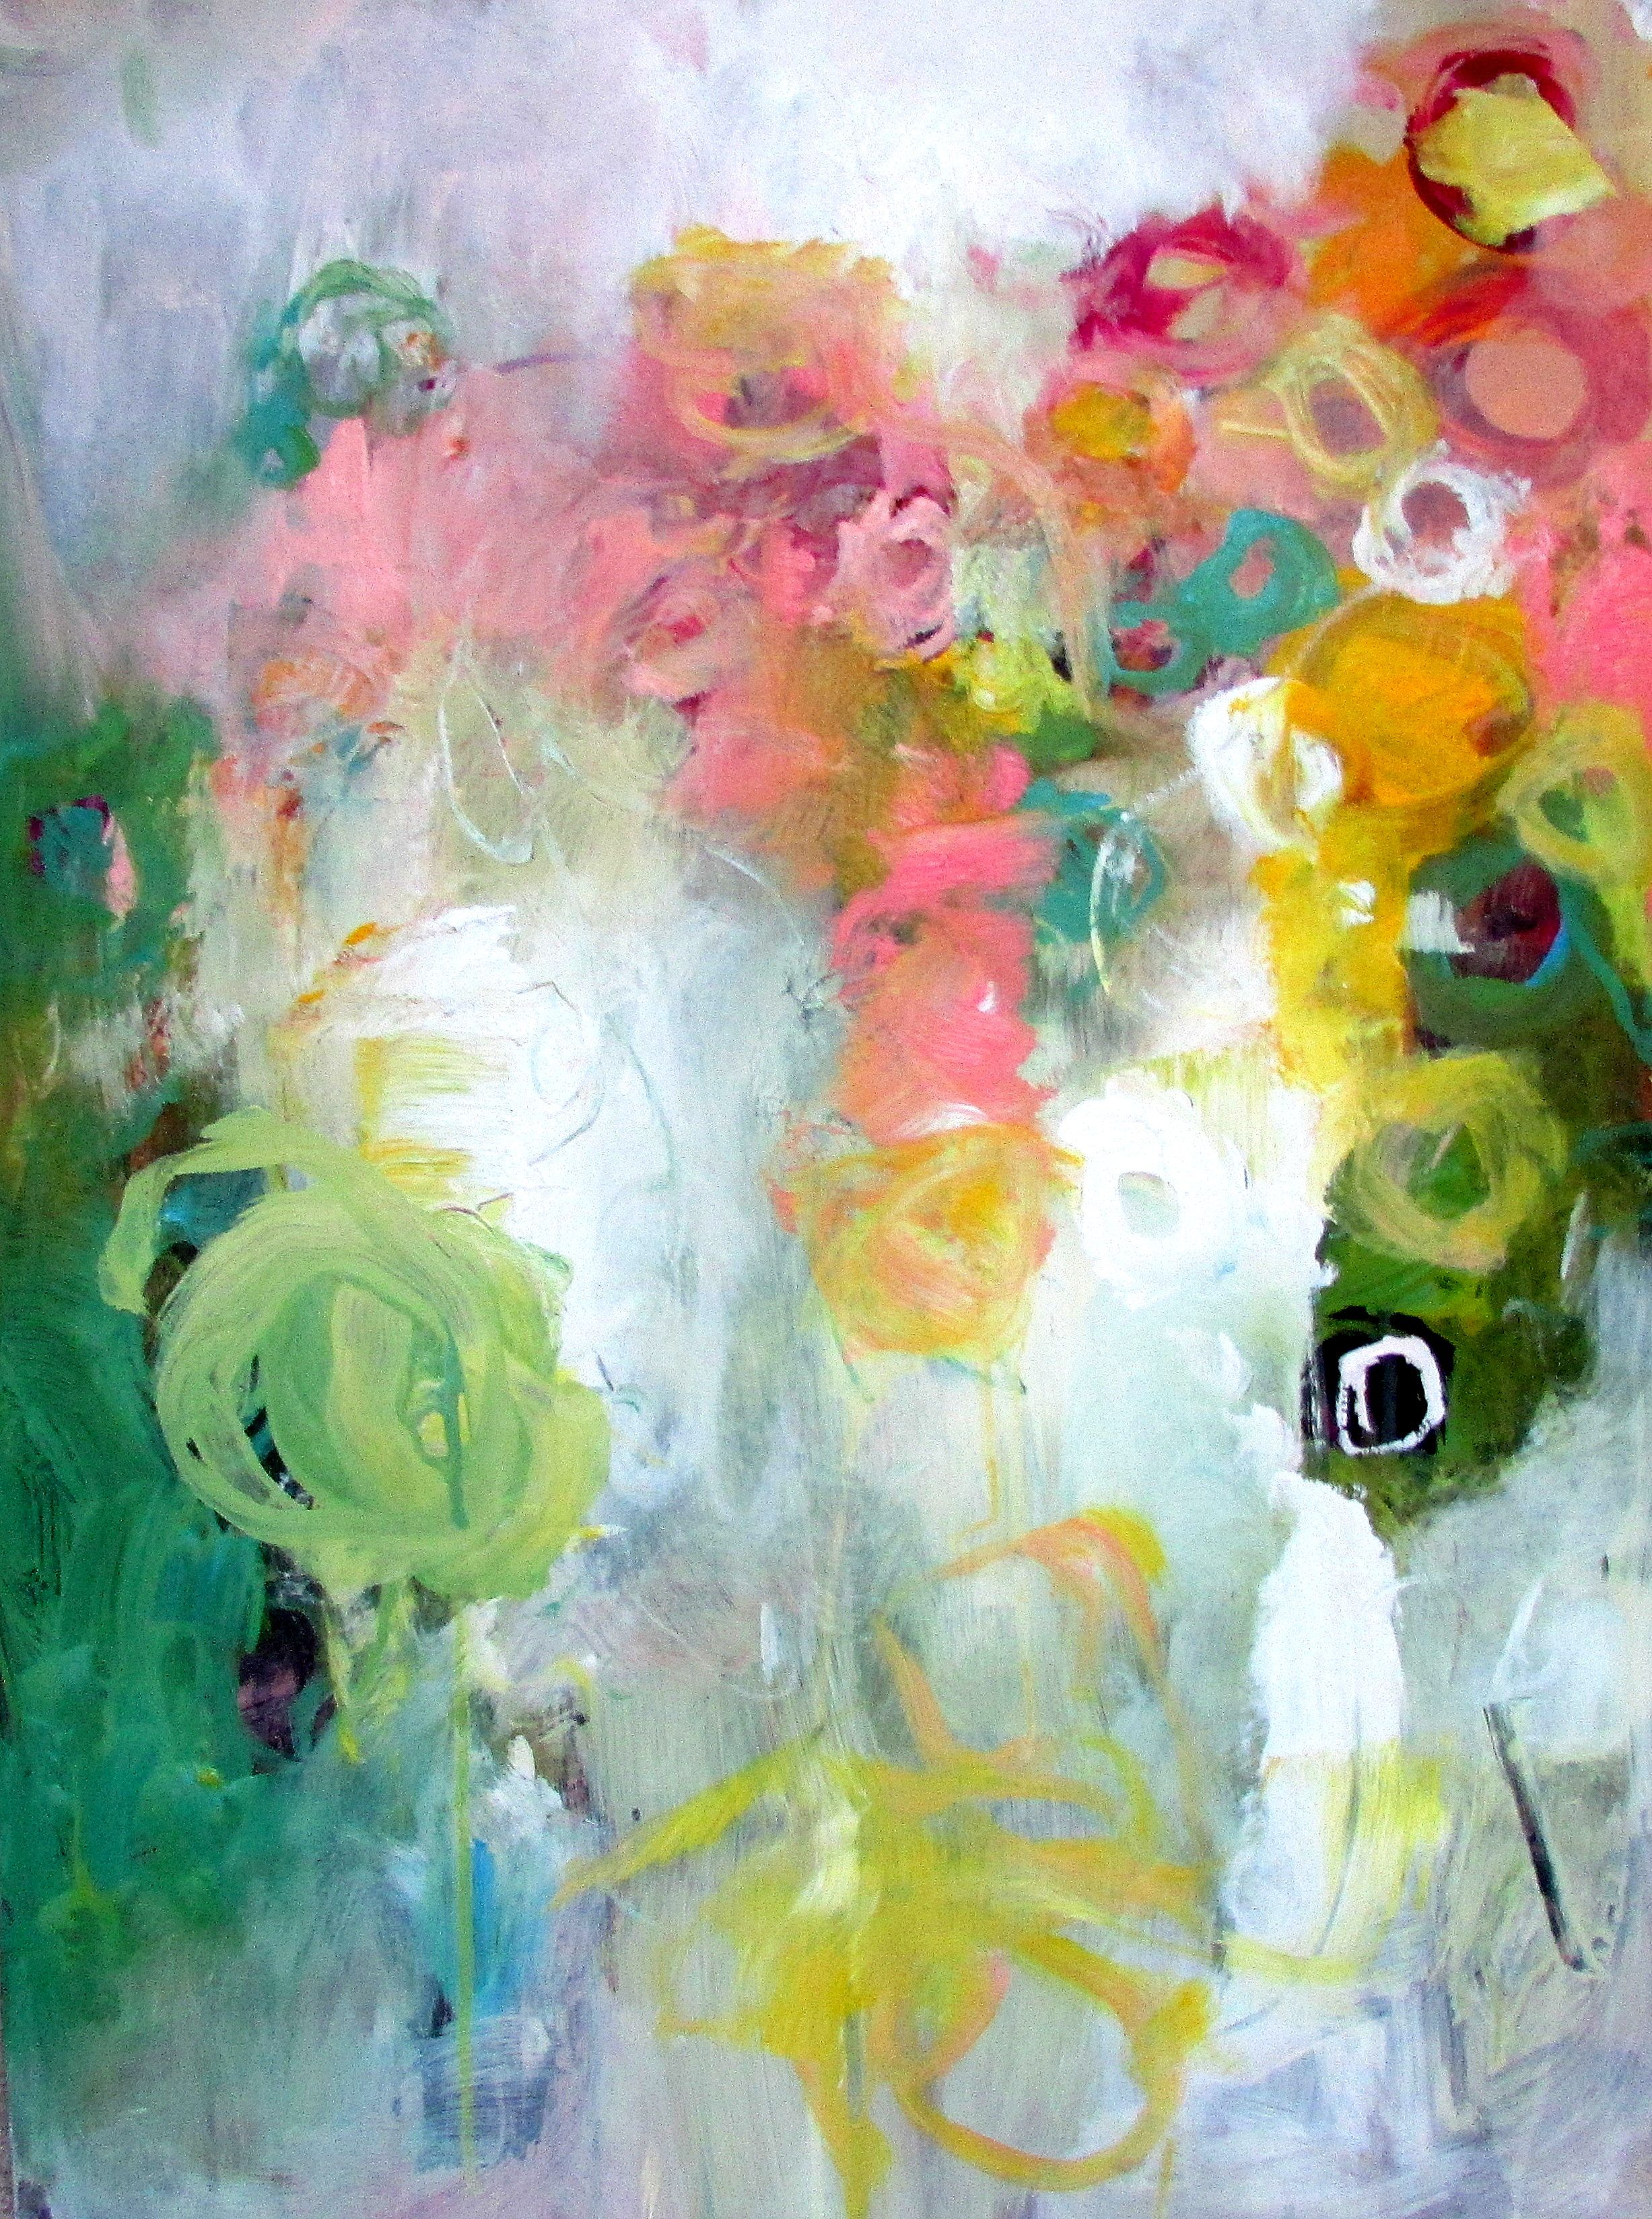 Abstrakte Malerier Billede Fra Tina Woulhoj Jakobsen Pa Maleri I 2020 Abstrakt Malerier